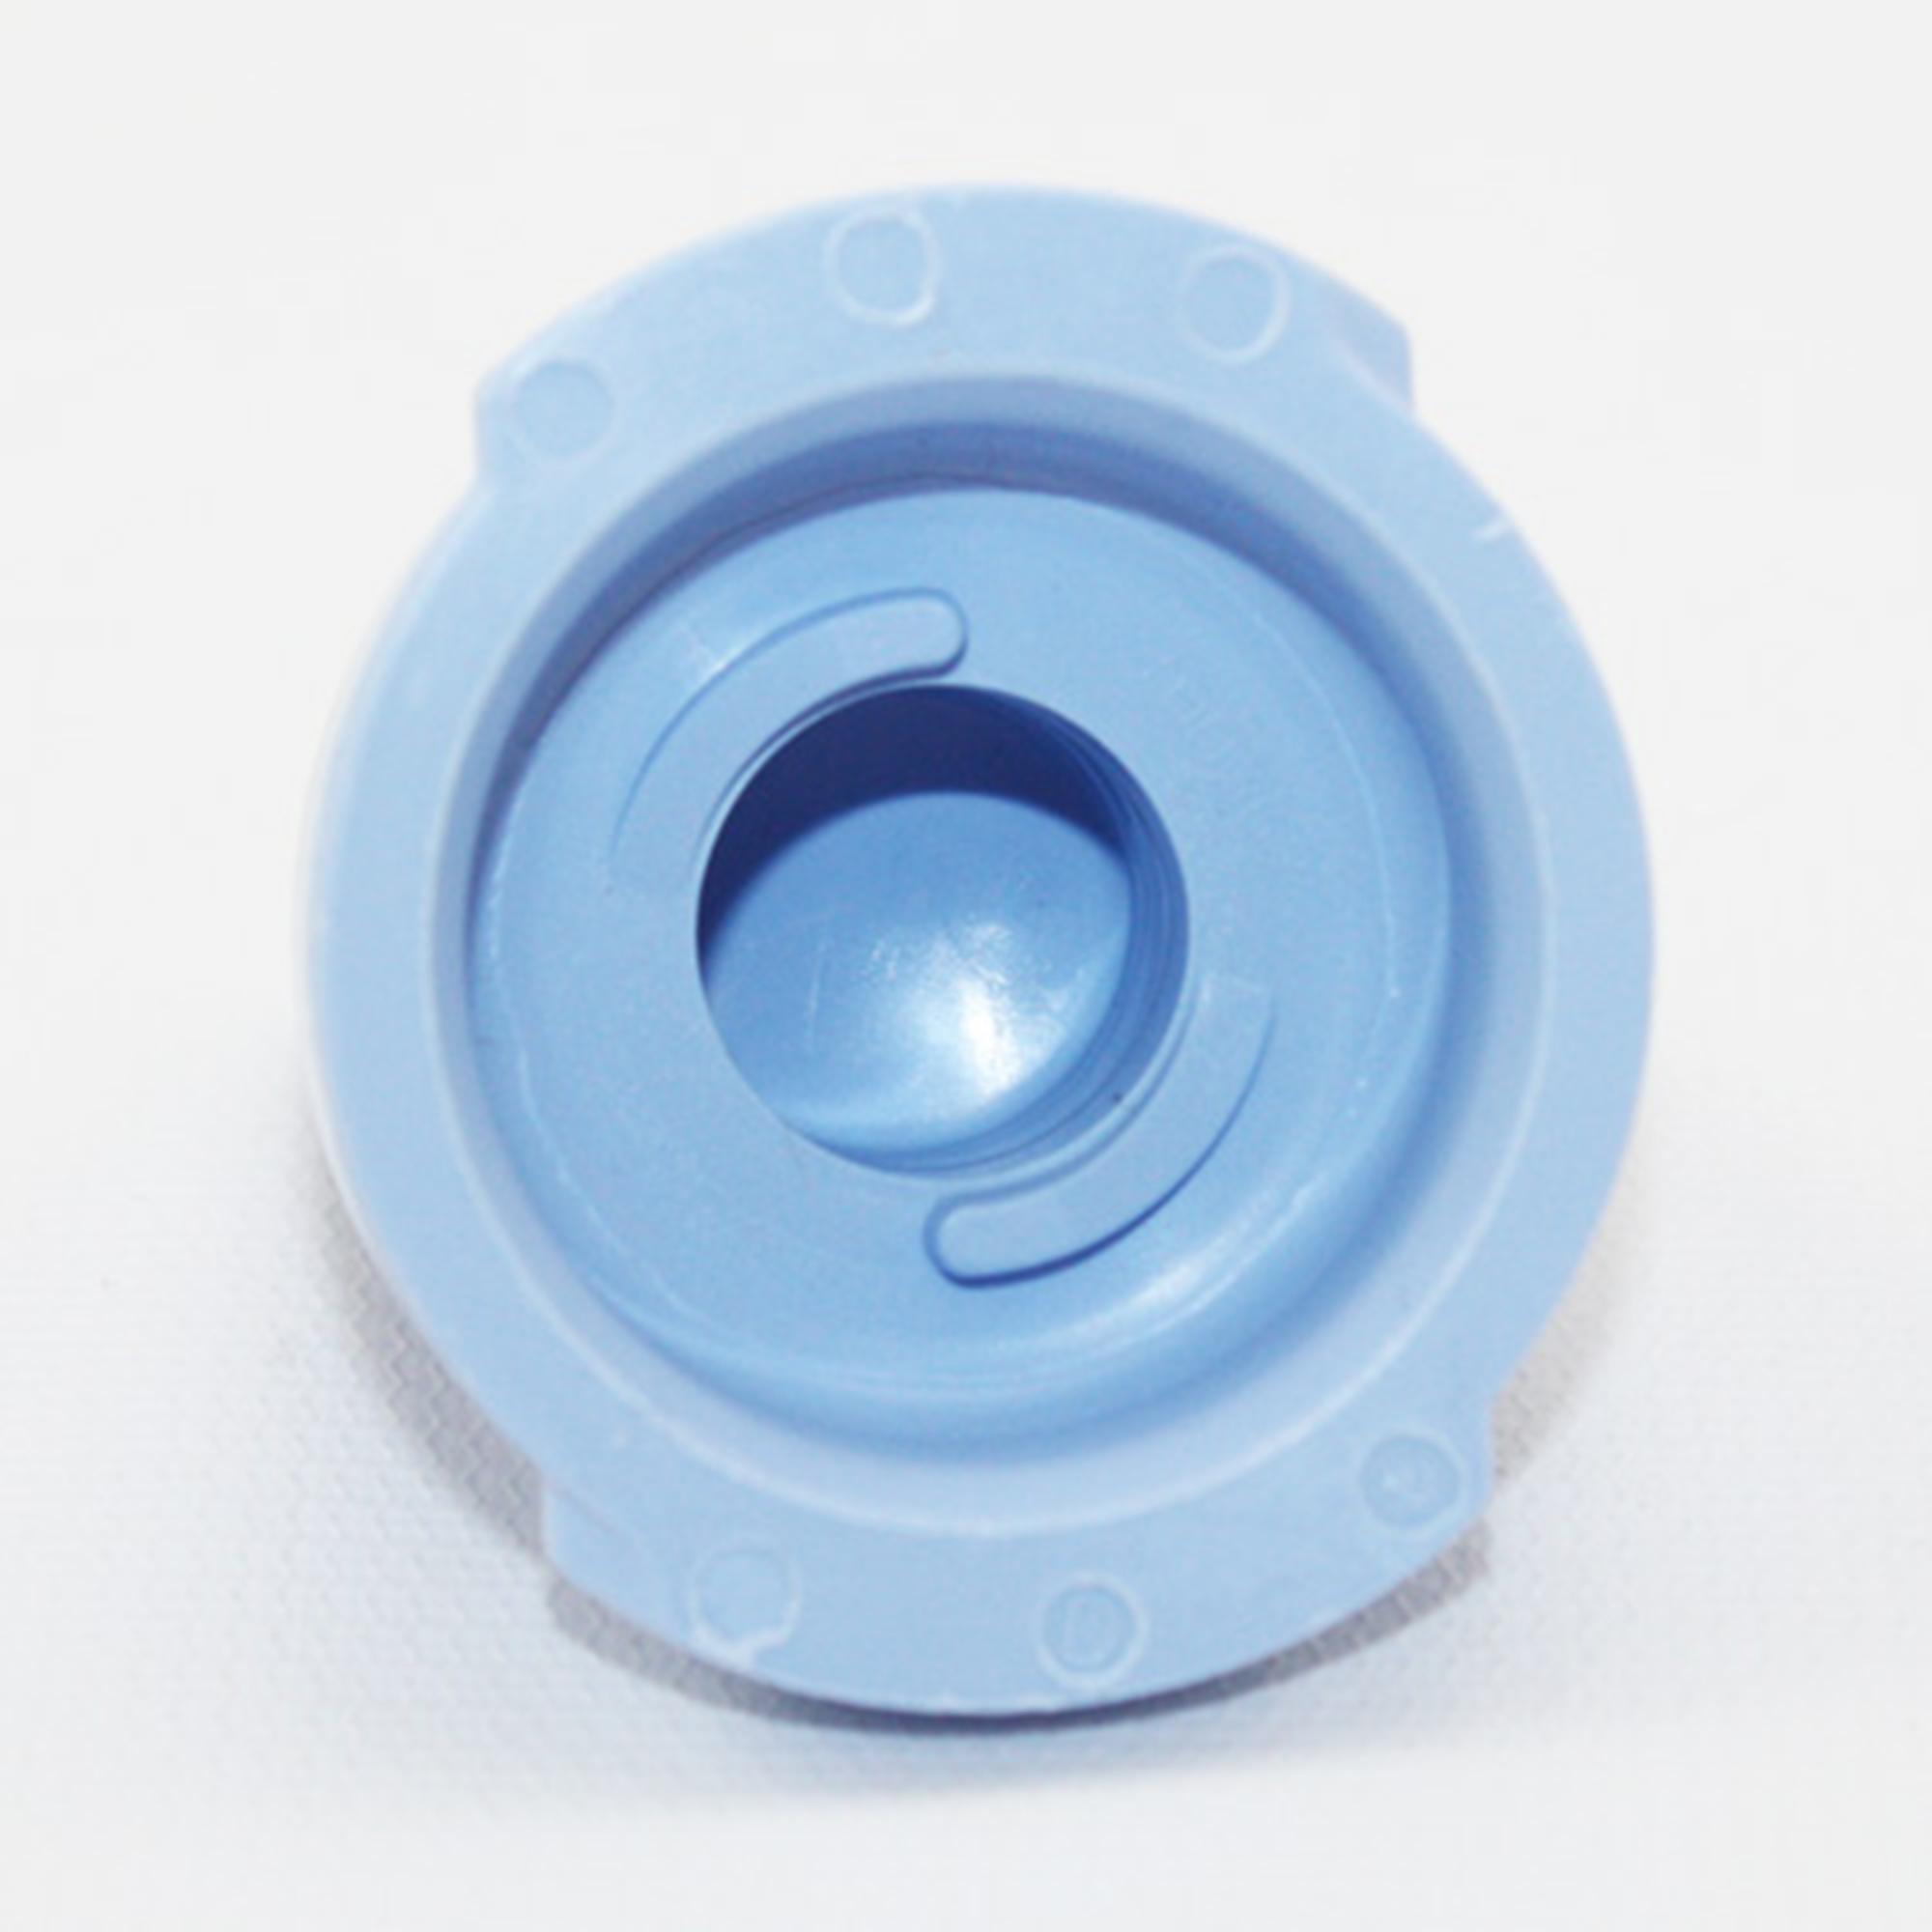 Genuine Oem 12664501 Refrigerator Water Filter Bypass Plug